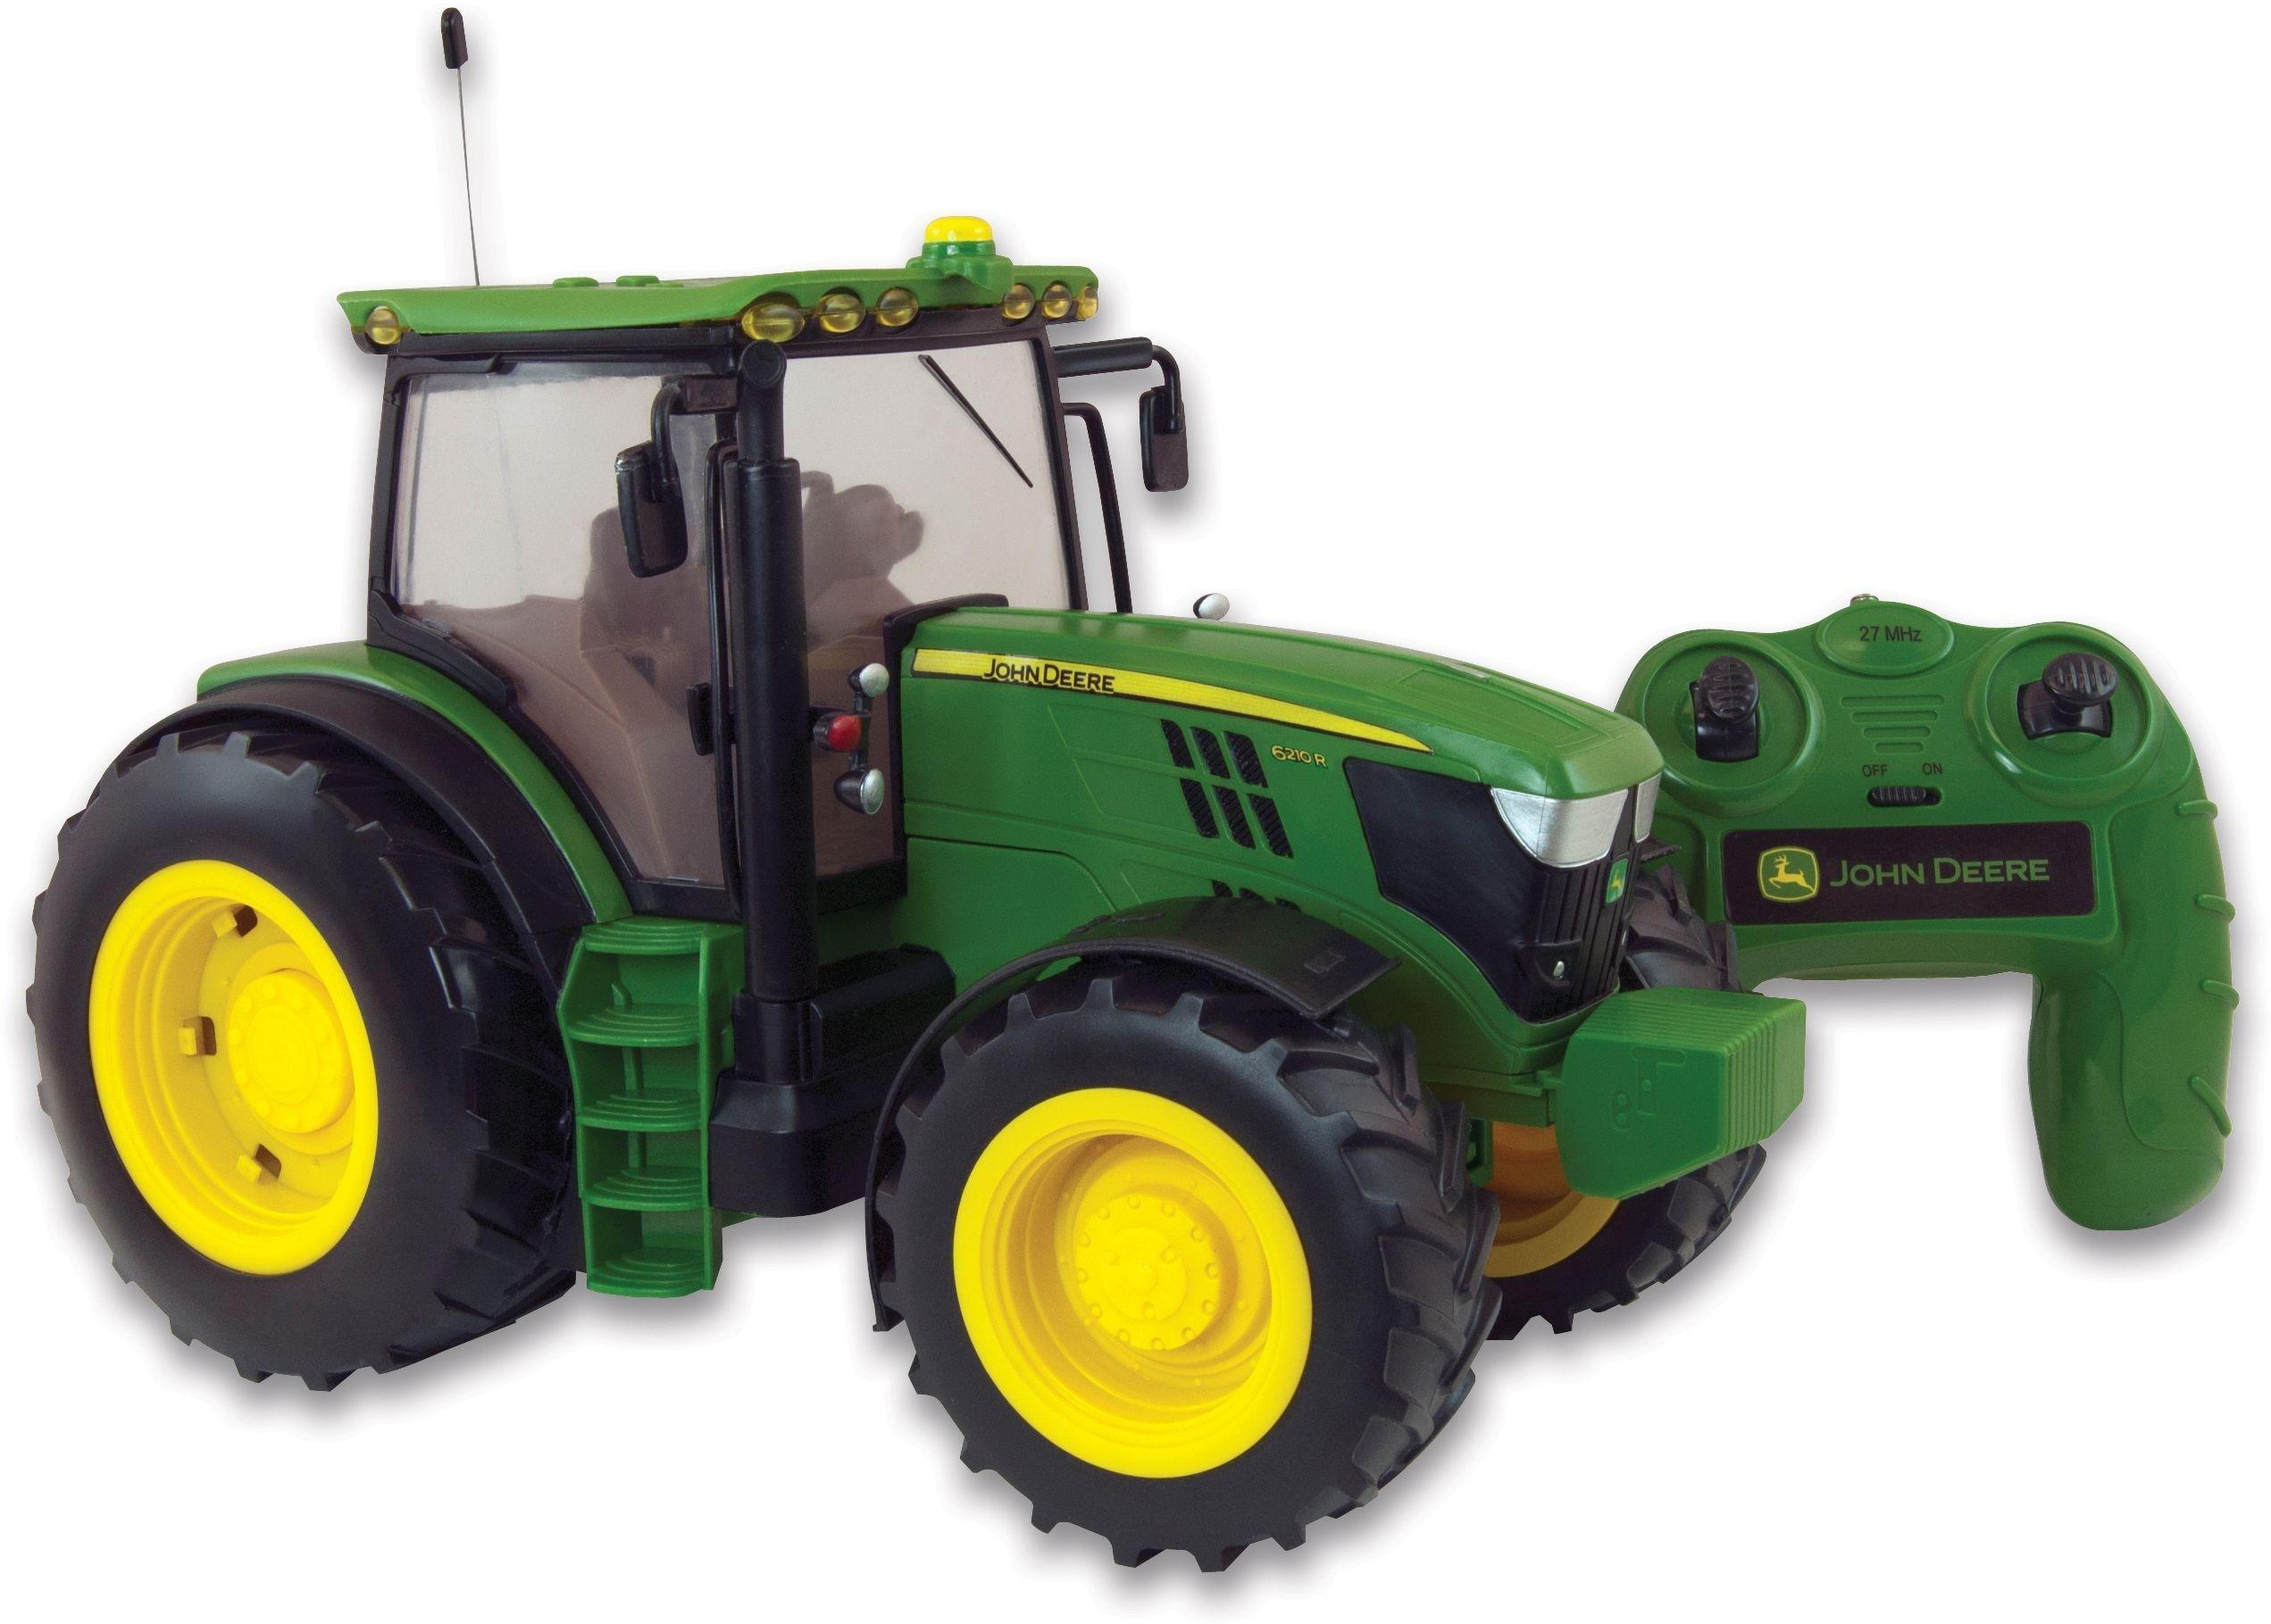 Image of Radio Controlled John Deere 6190R Tractor.